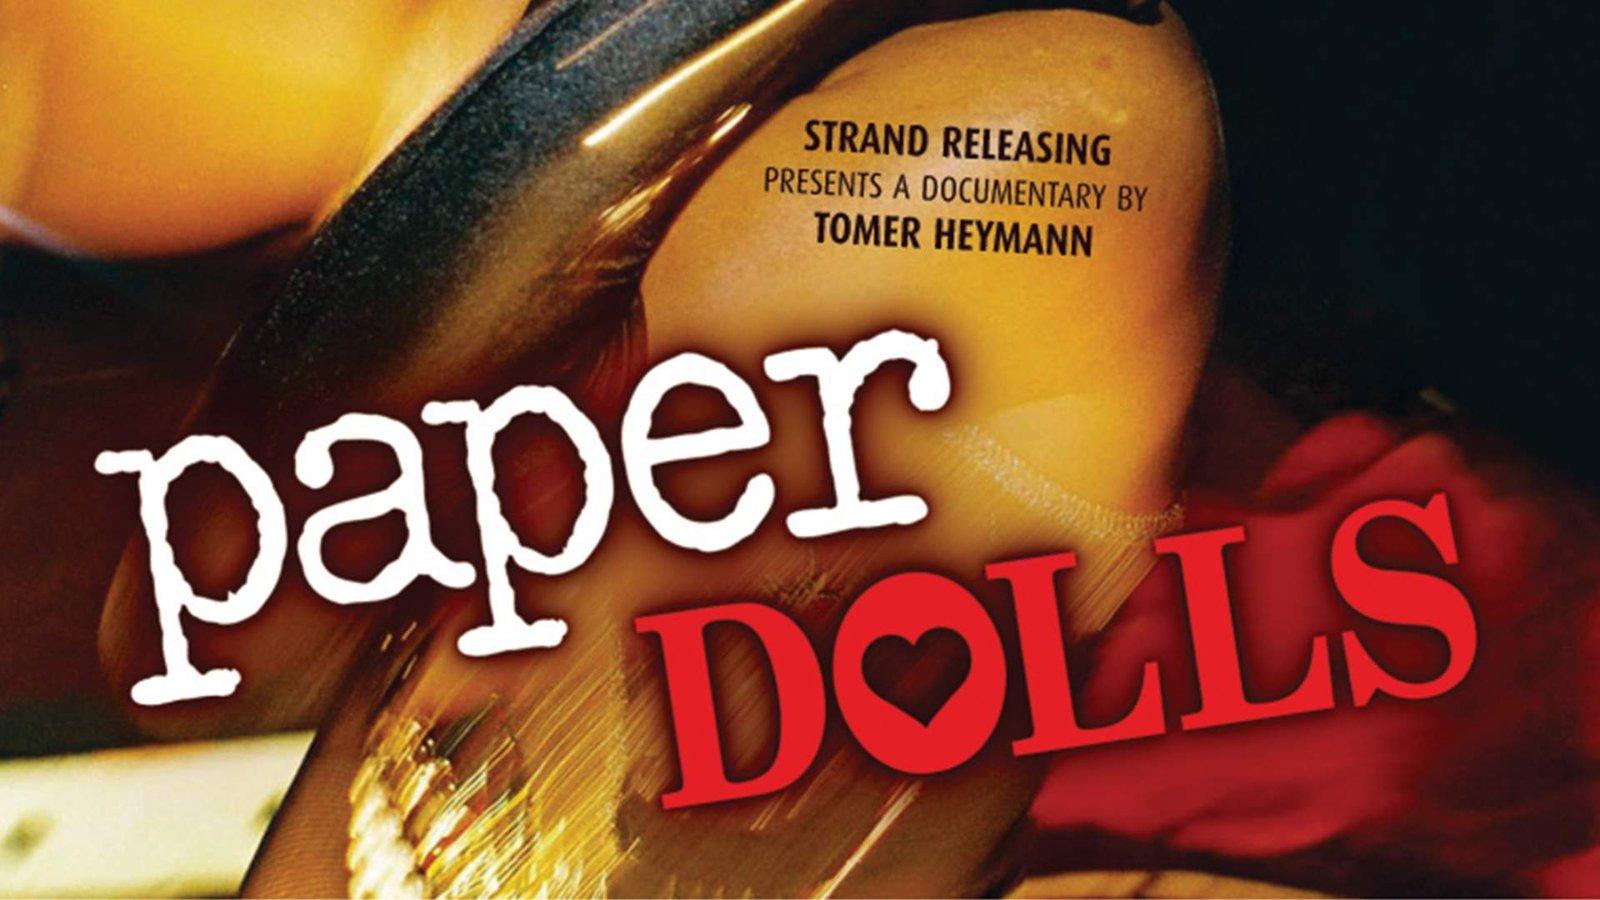 Paper Dolls - A Filipino Trans Community in Israel